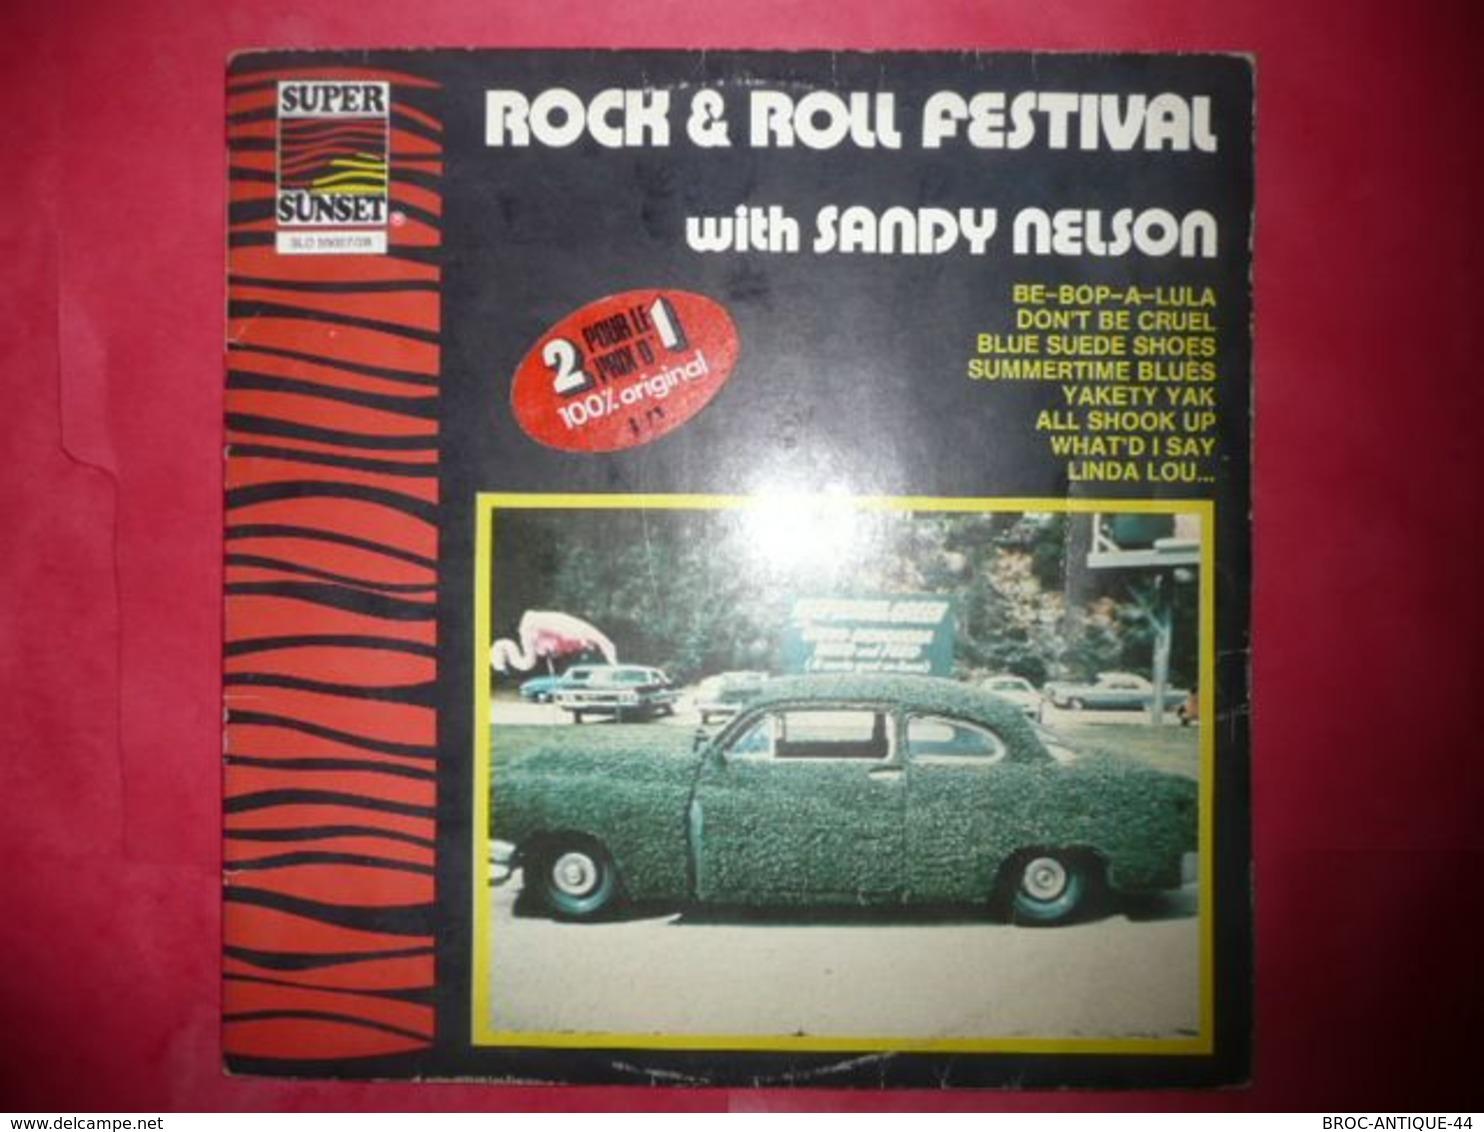 LP33 N°5122 - SANDY NELSON - SLD 55027/28 - 2 LP'S - Rock